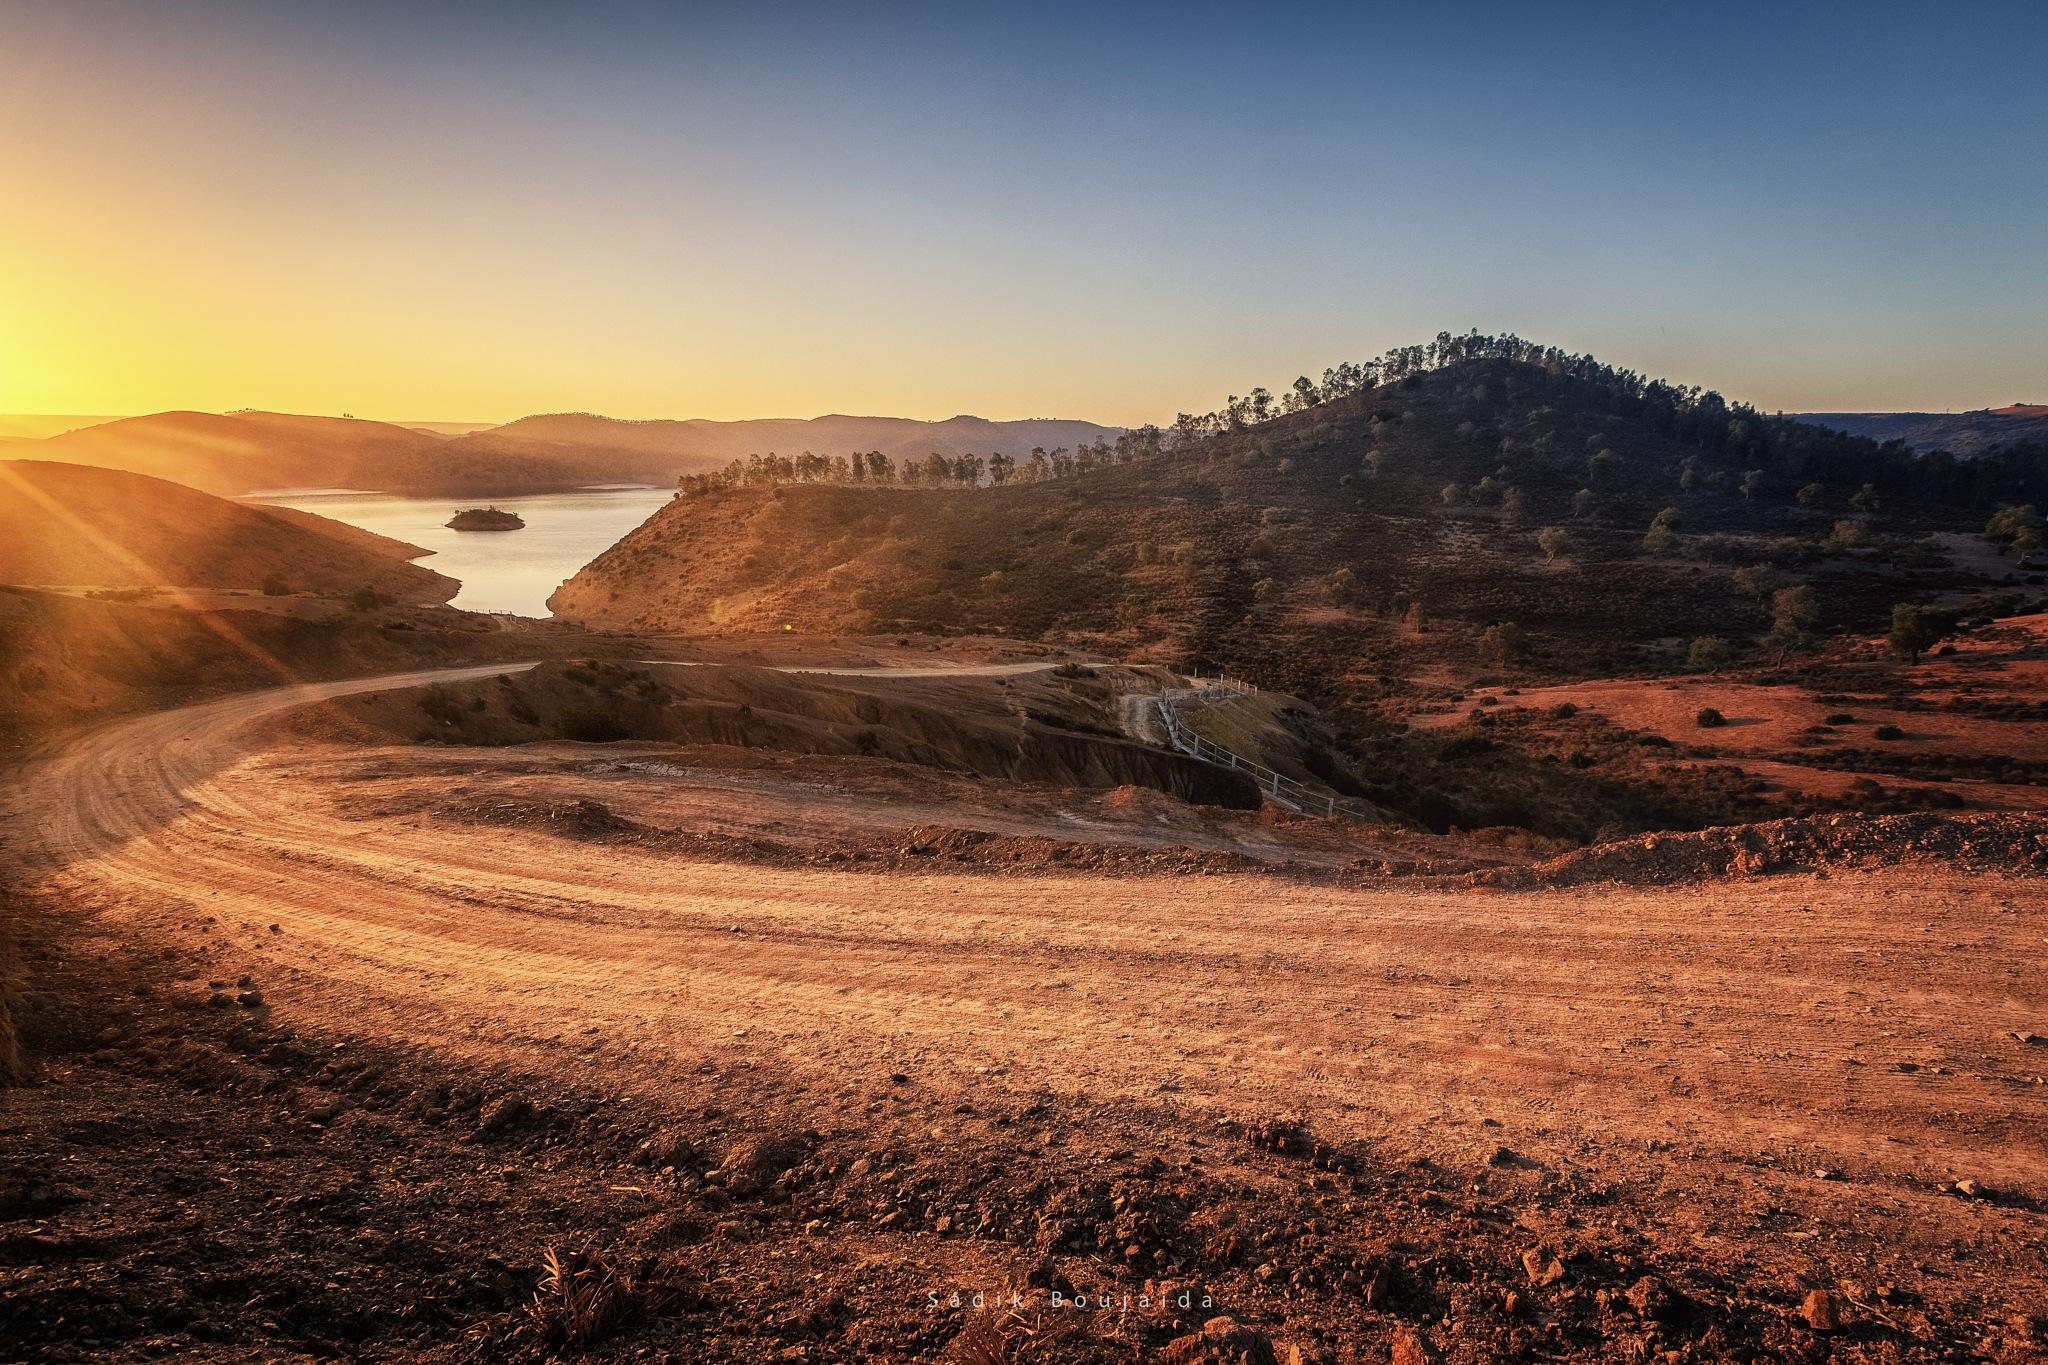 Country Road by Sadik Boujaida